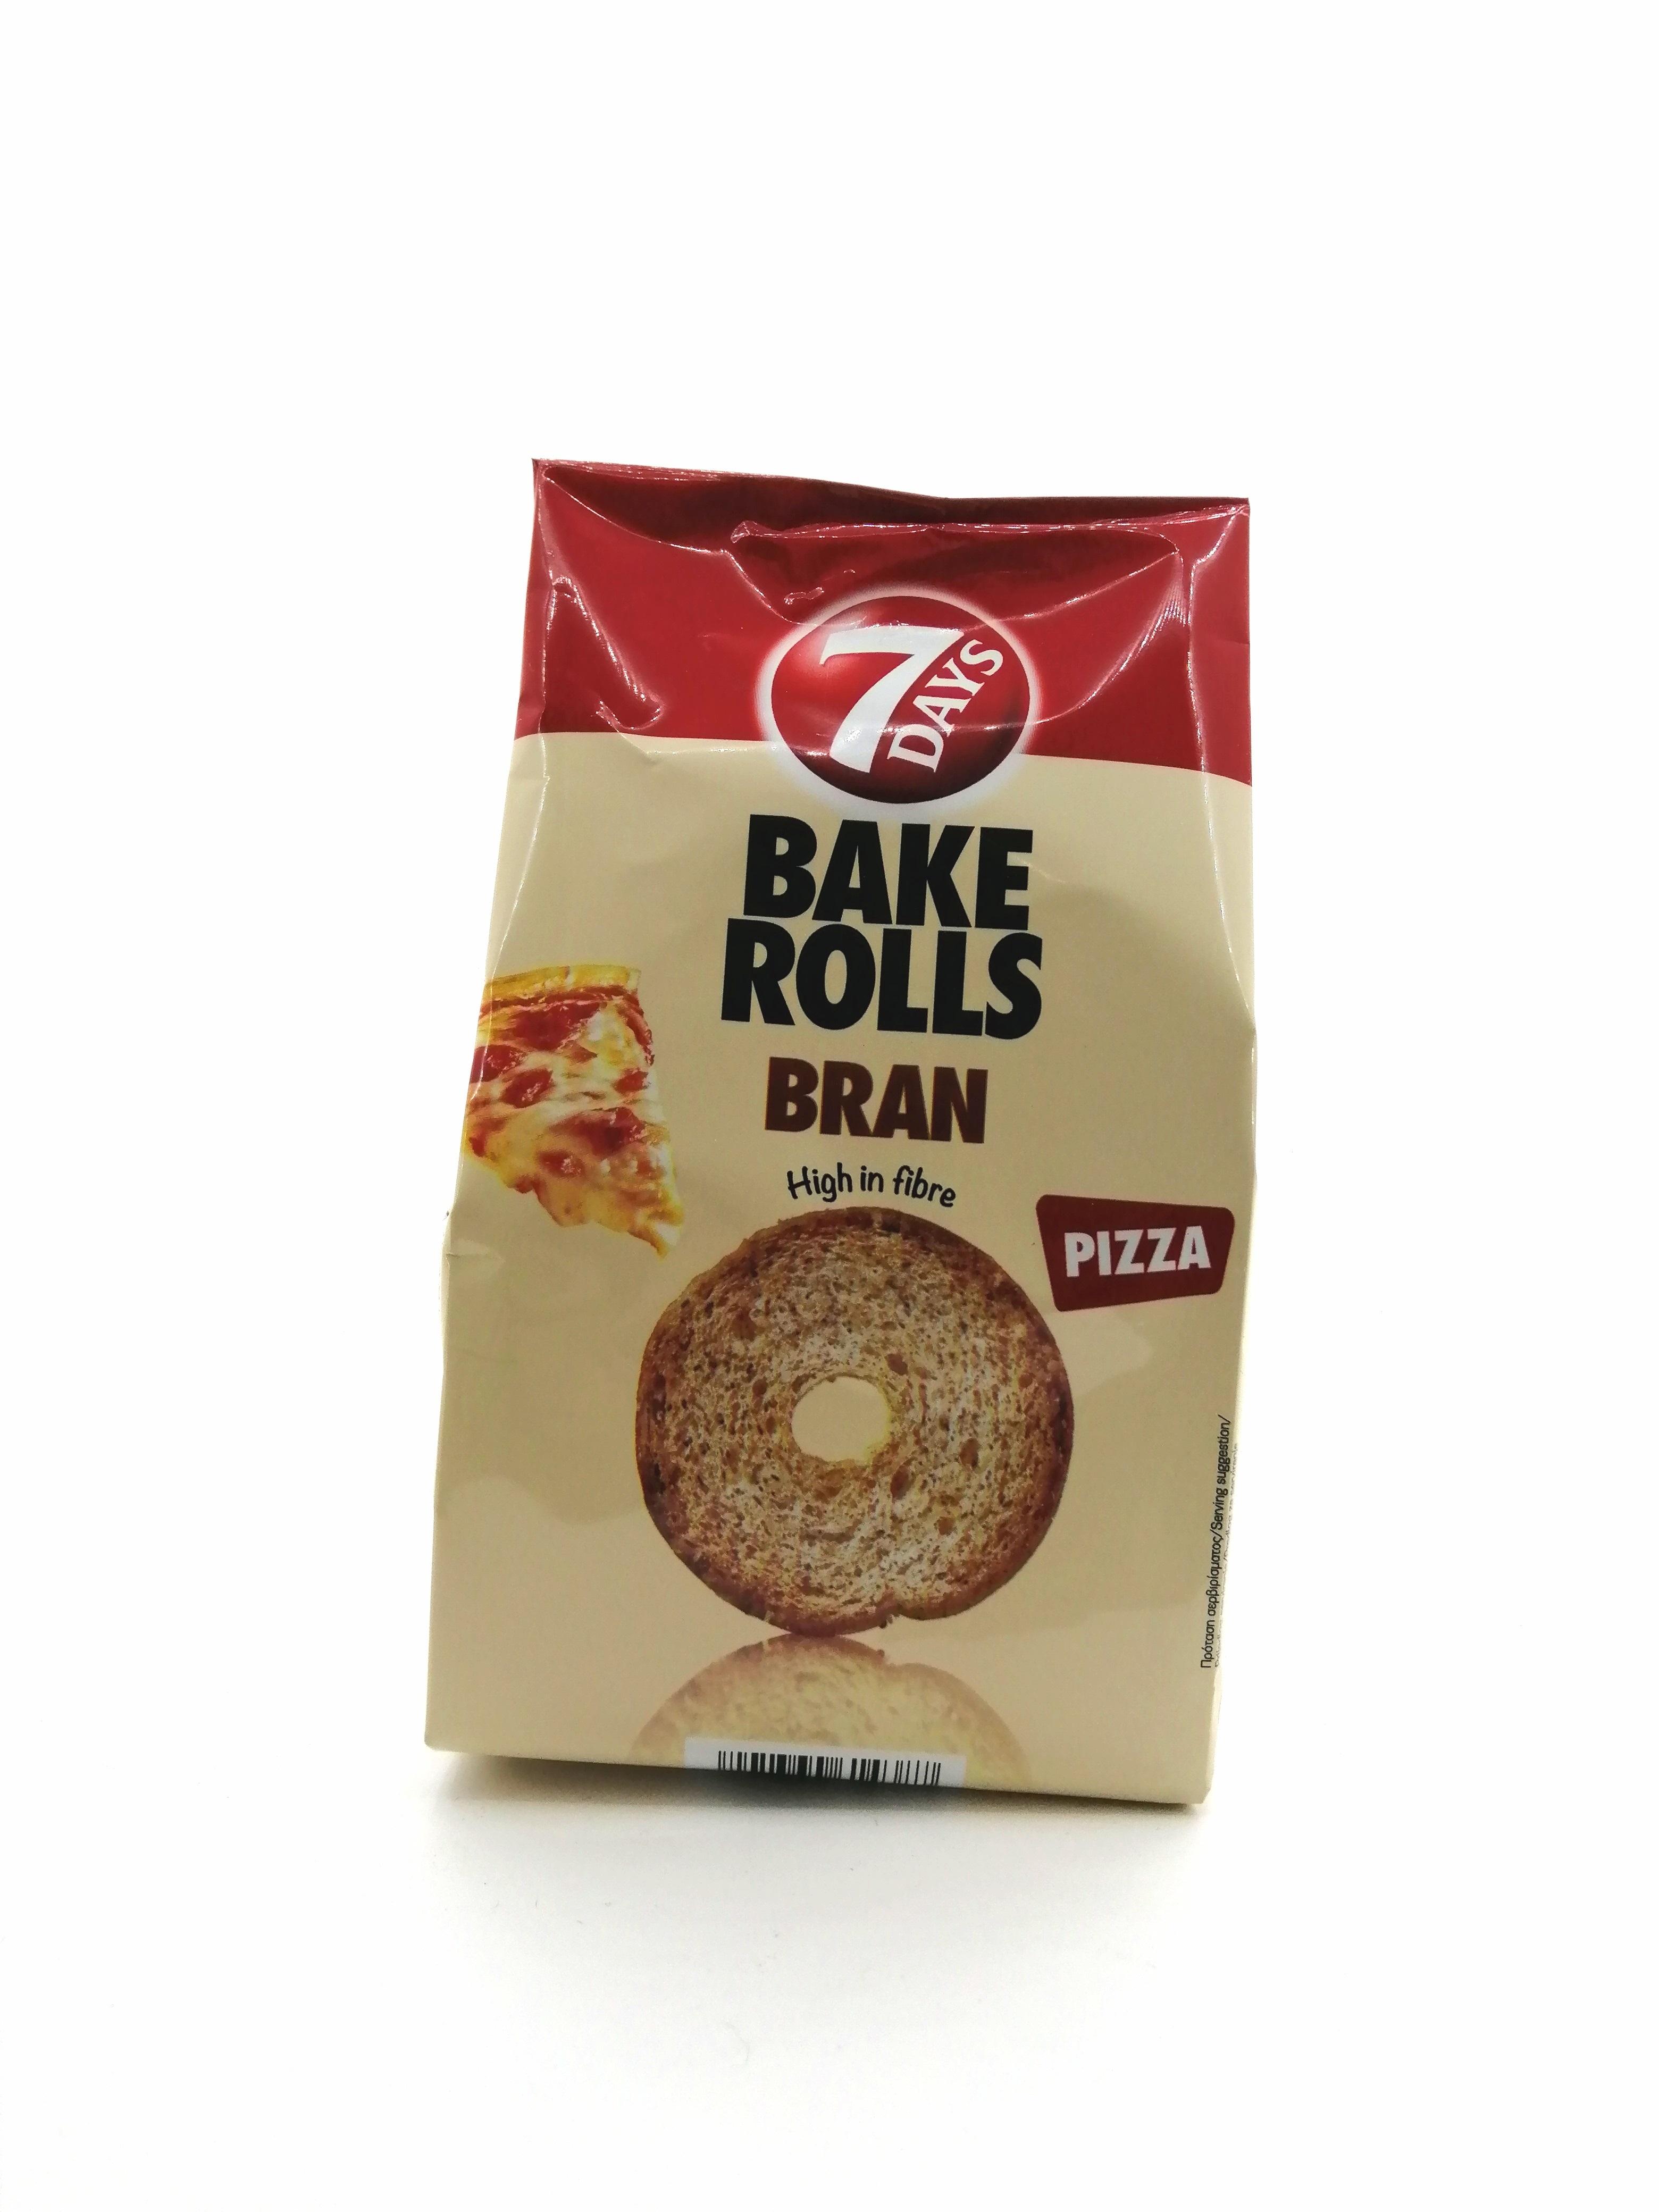 7D BAKE ROLLS BRAN PIZZA 80GR